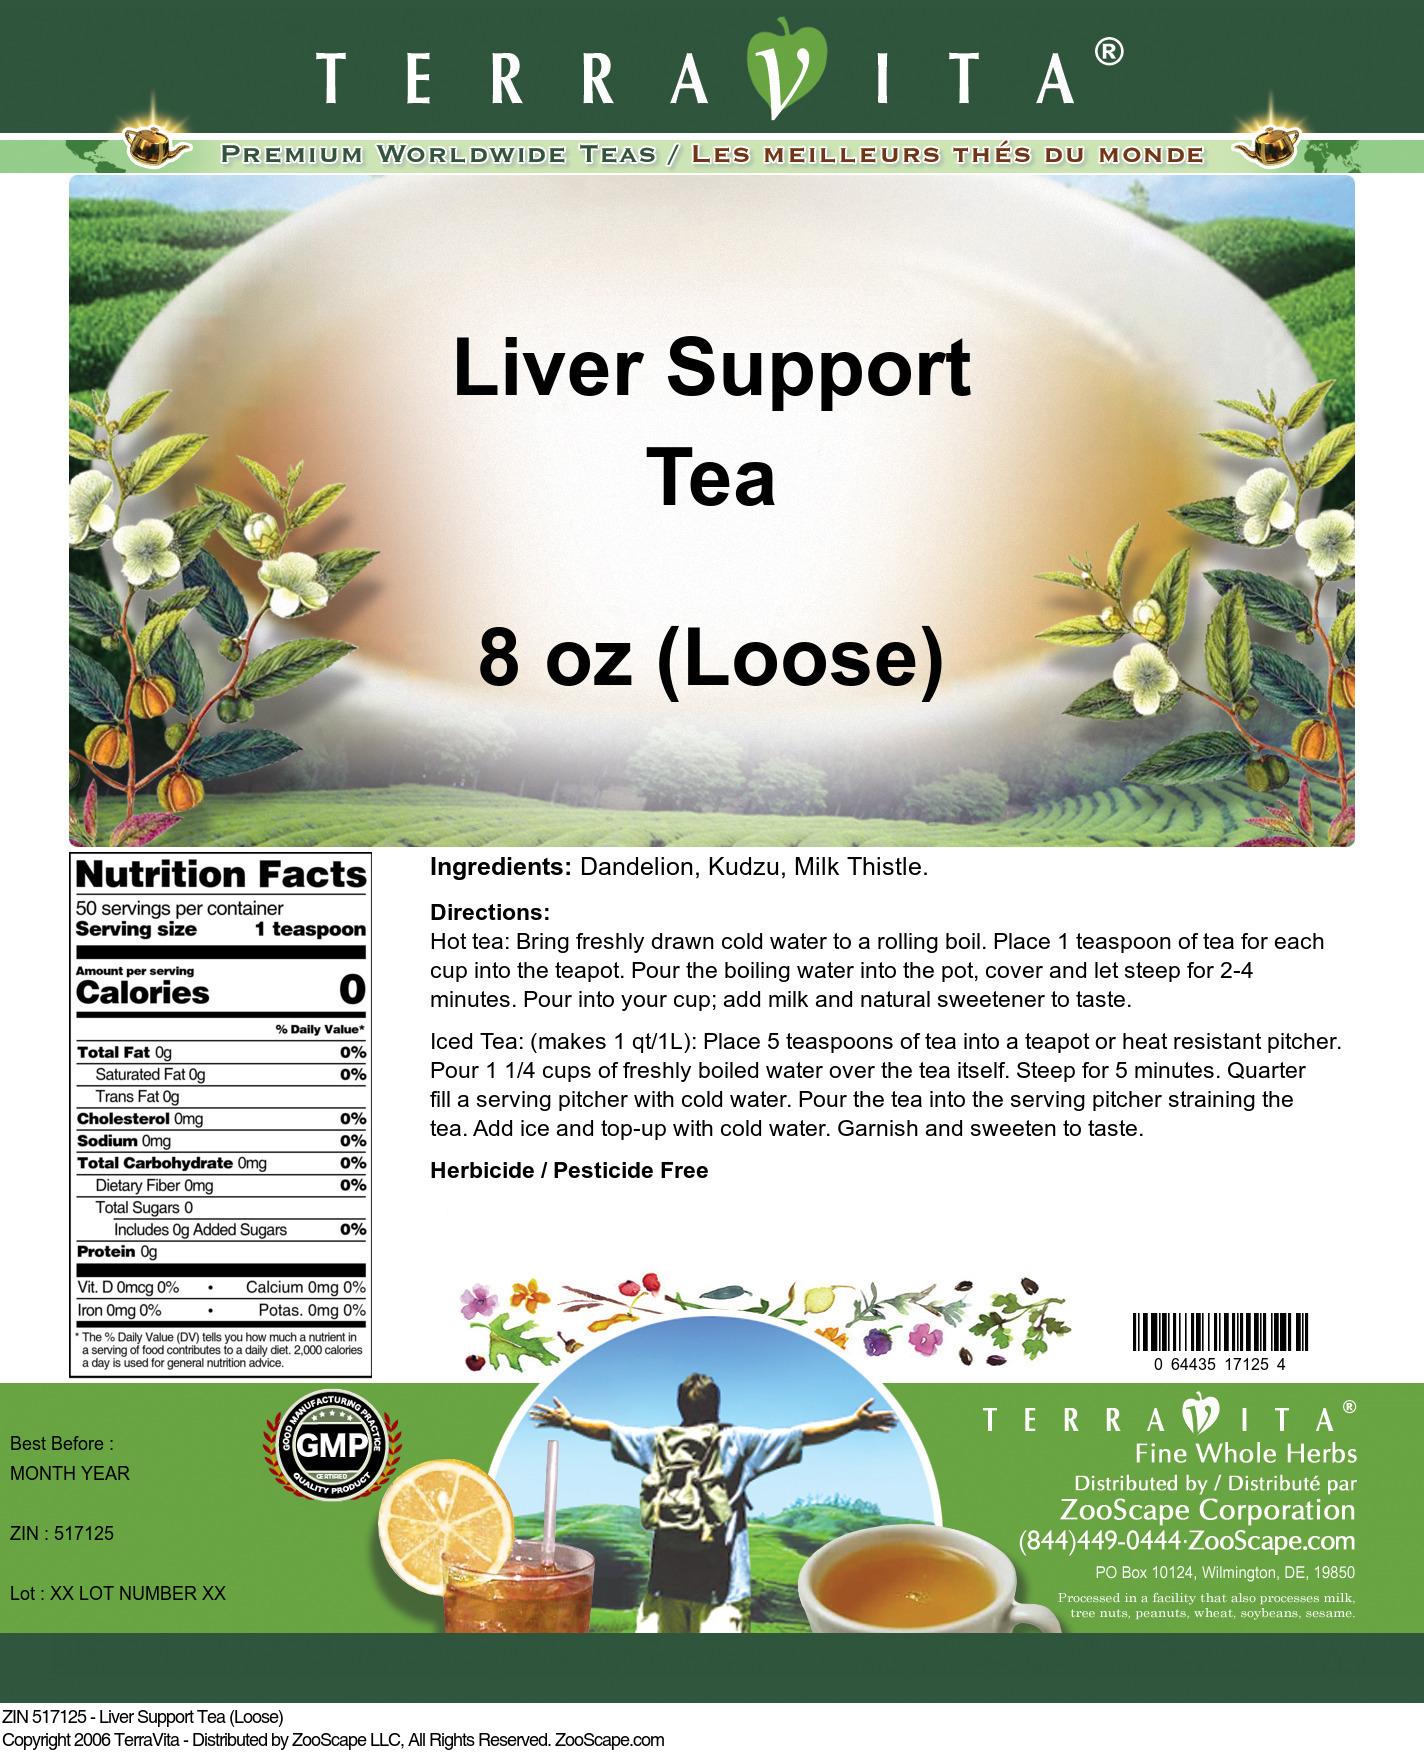 Liver Support Tea (Loose)